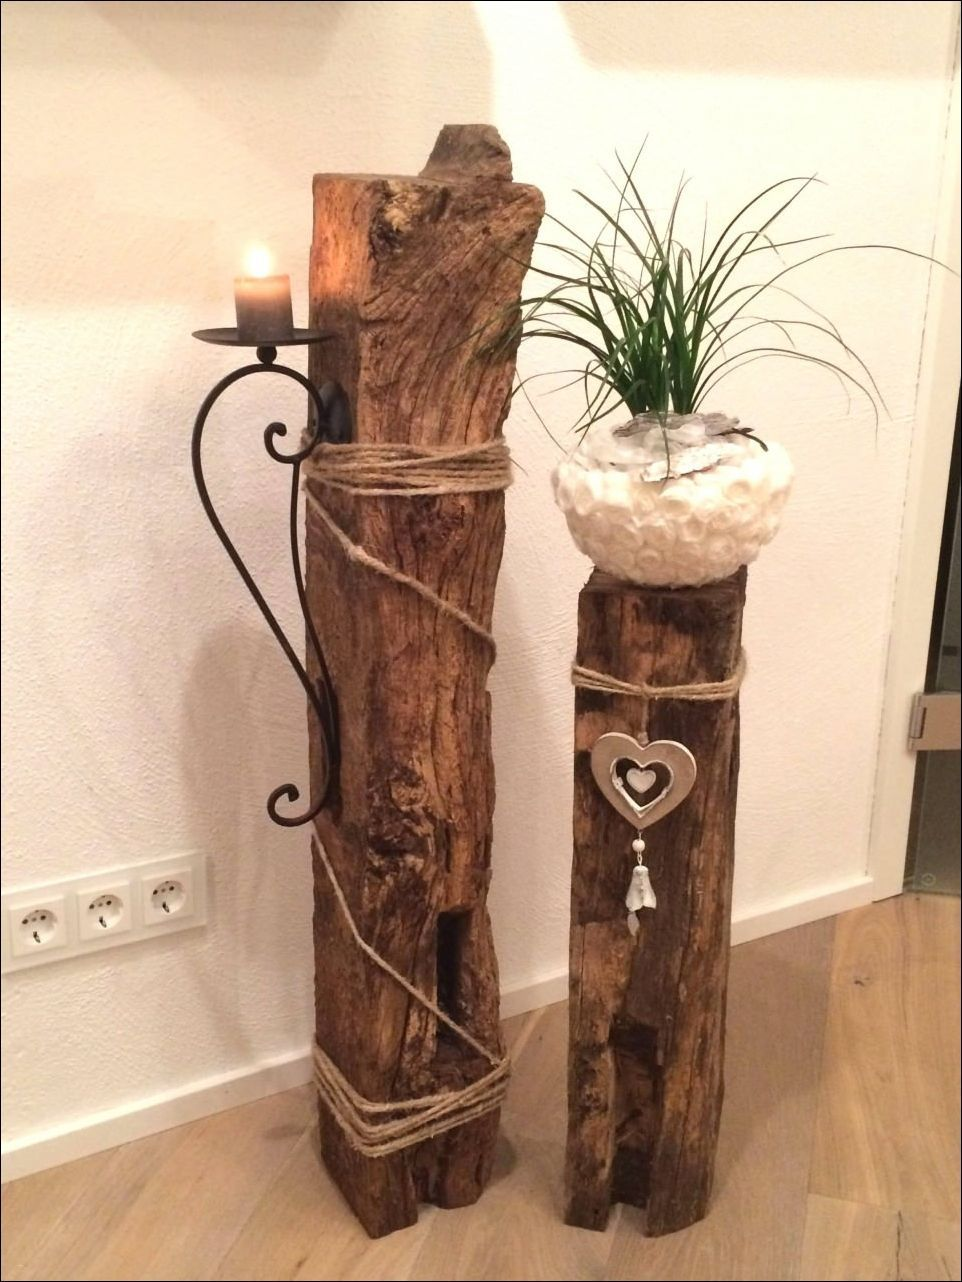 Holz Ideen Selber Machen Neu Weihnachtsdeko Aus Holz Selber Basteln Stunning Ideen Aus